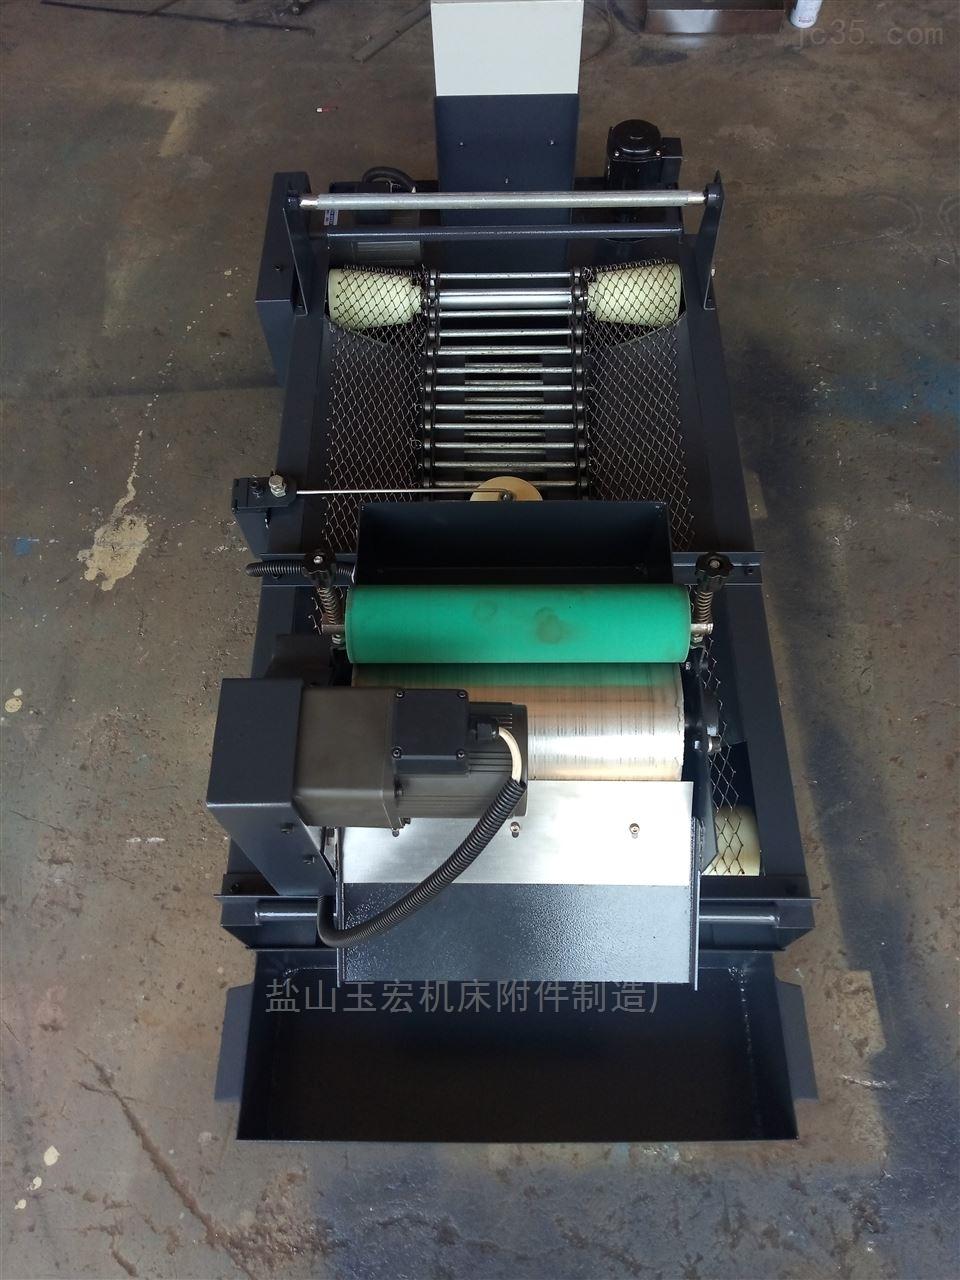 50L/min纸带过滤机和磁性分离器组合使用